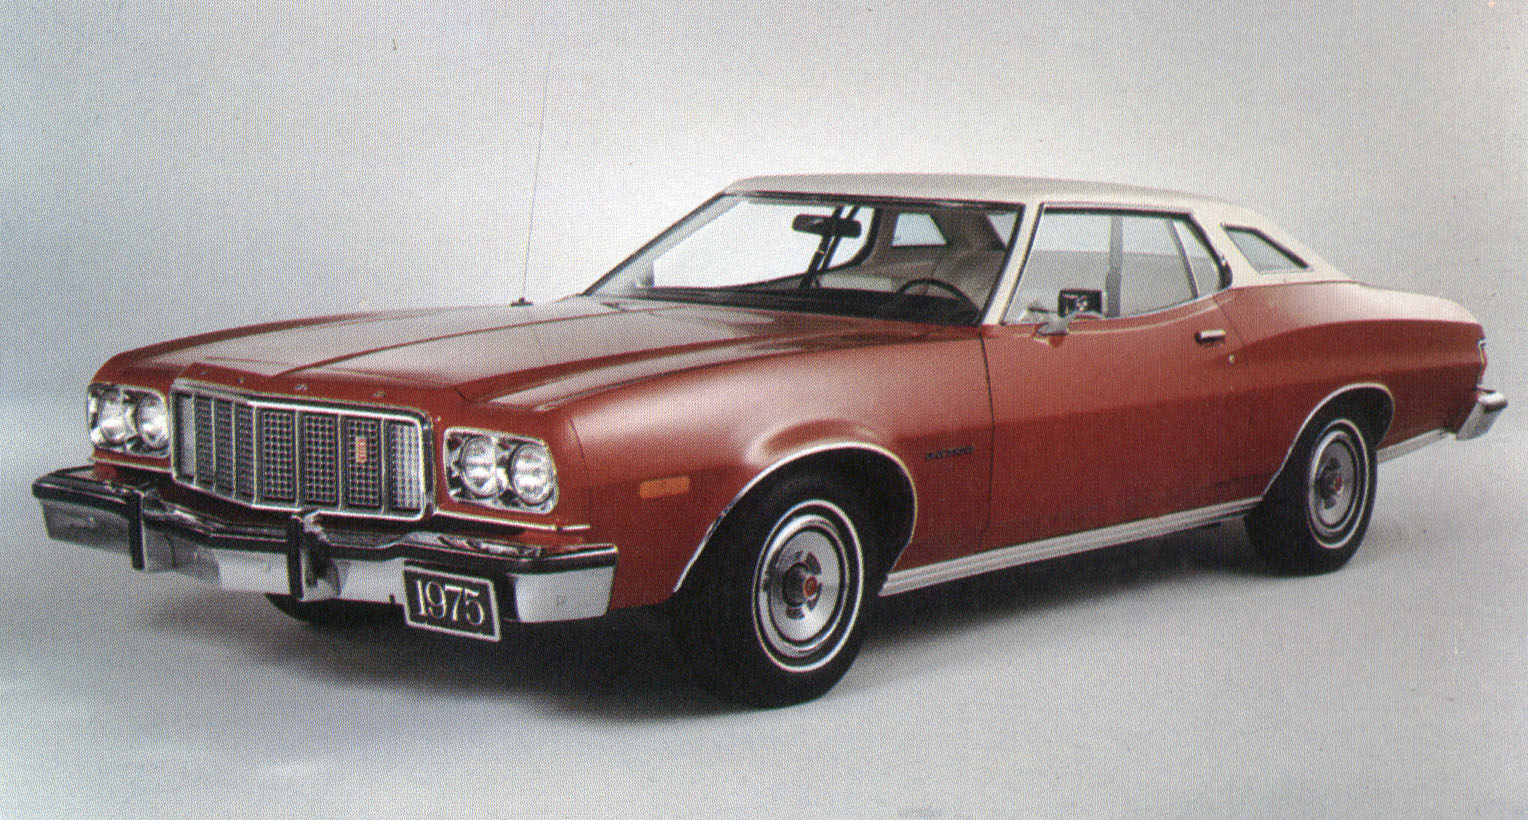 Lost Star Cars: Gary Rossington's 1976 Ford Torino